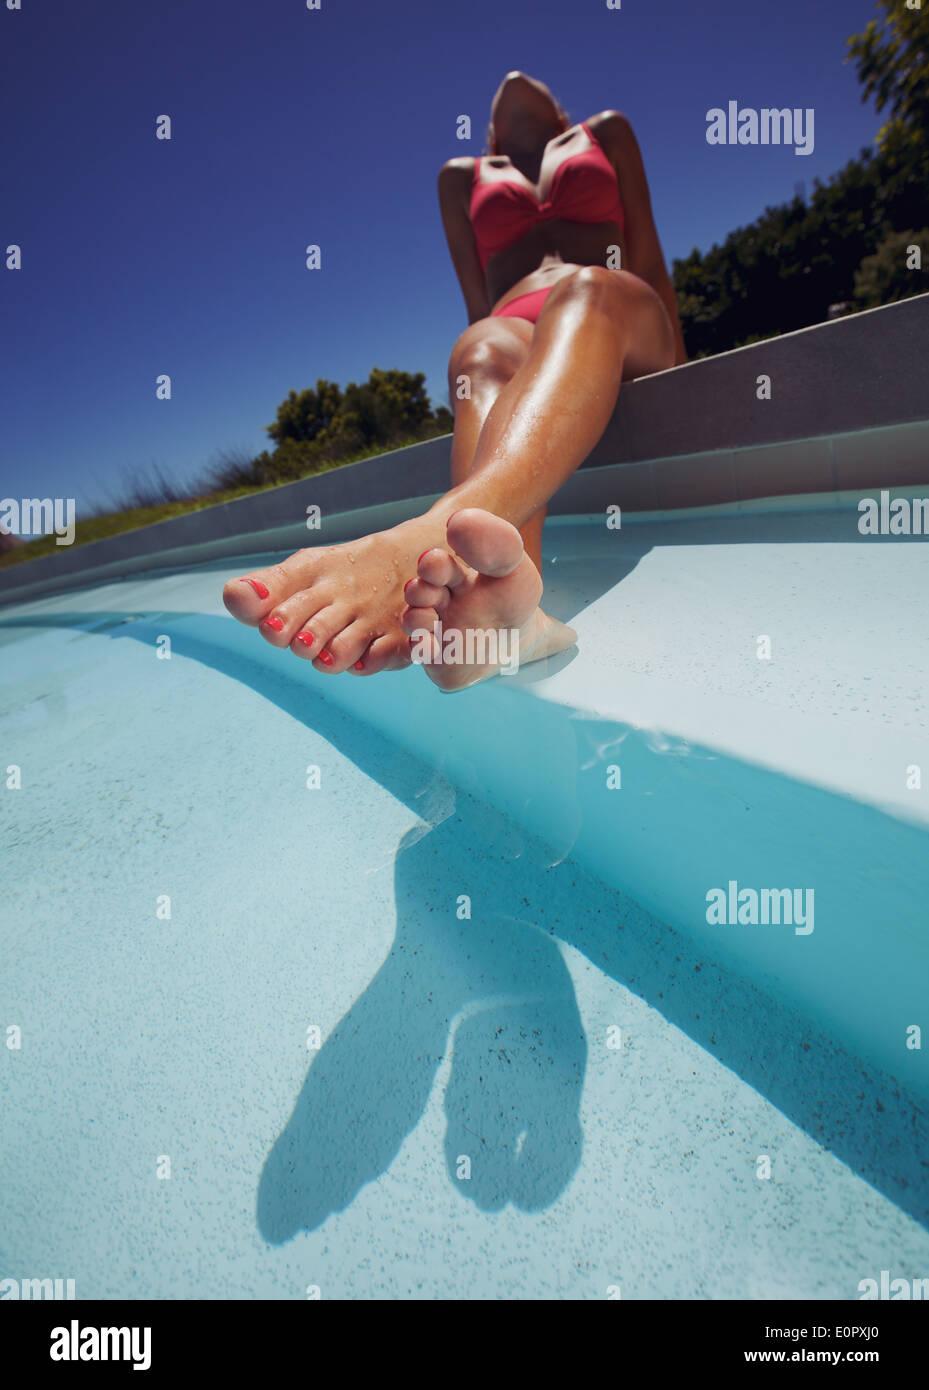 Low angle view of young woman wearing bikini enjoying the sun by the pool. Female model sunbathing by swimming pool. - Stock Image